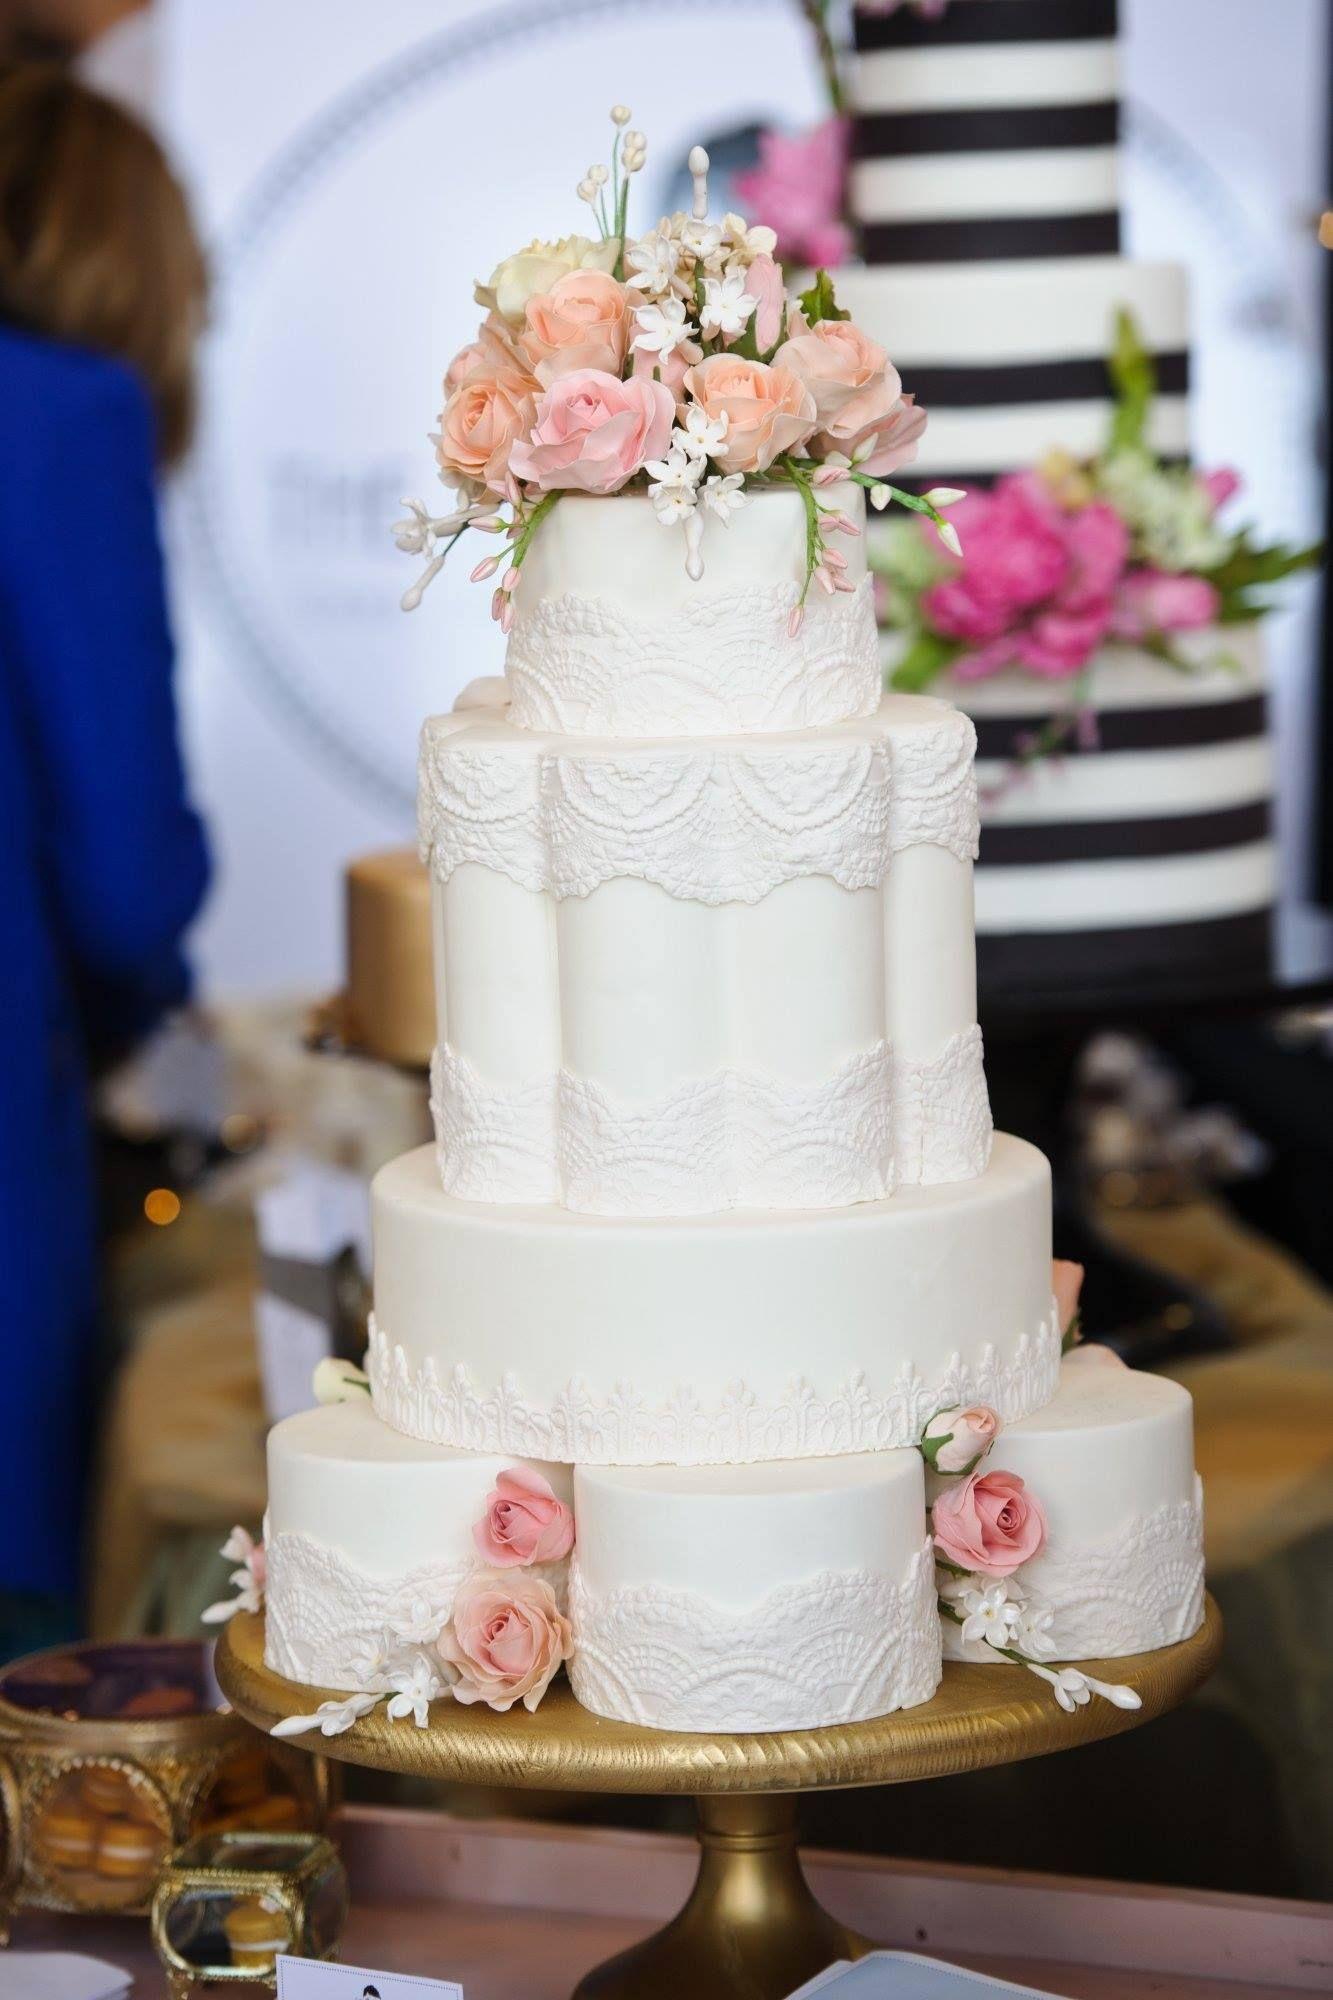 40 Wedding Cake Designs with Elaborate Fondant Flowers | Wedding ...